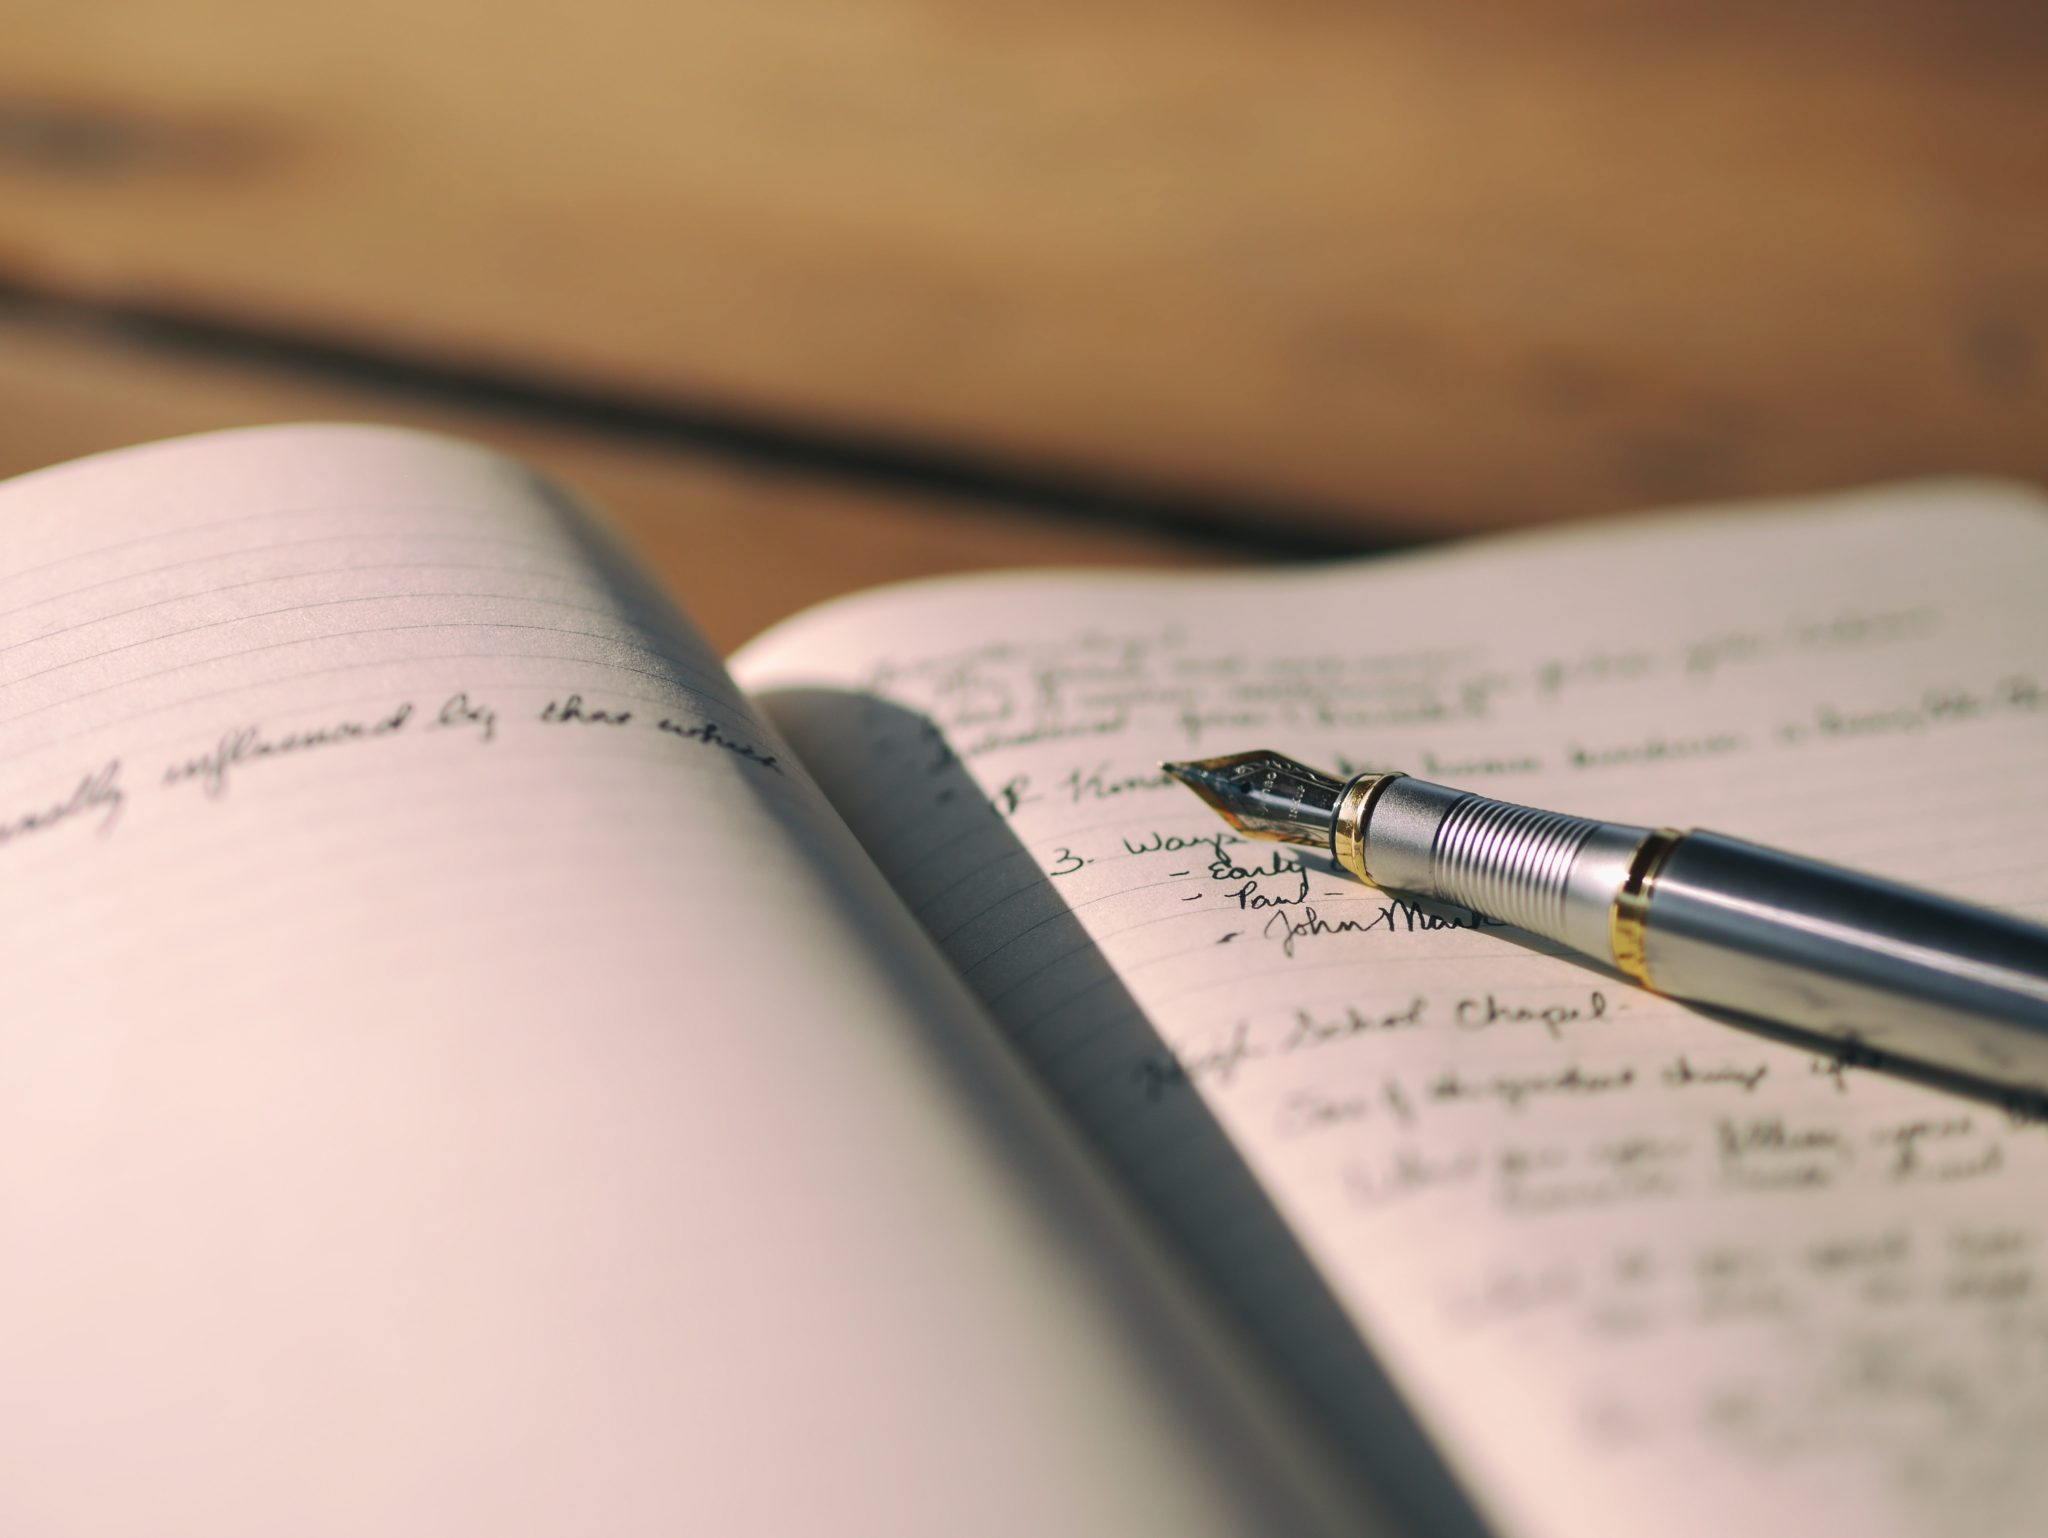 PTEアカデミック Writing Summarize Written Text 対策 普通にやればIELTS7.0以上簡単に取れます